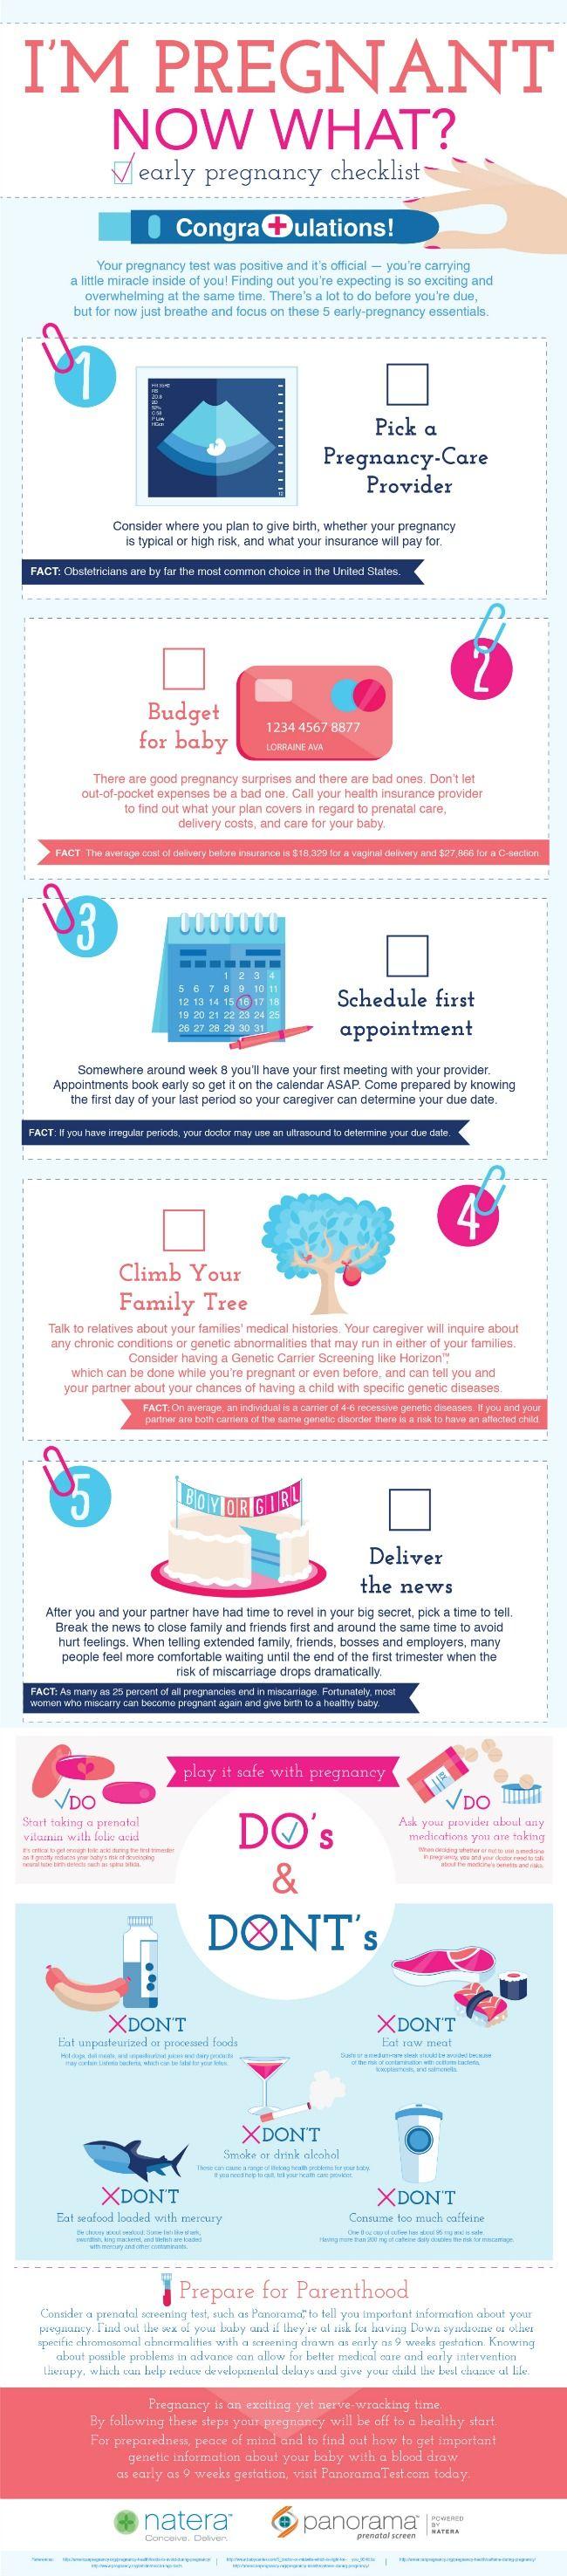 Early Pregnancy Checklist